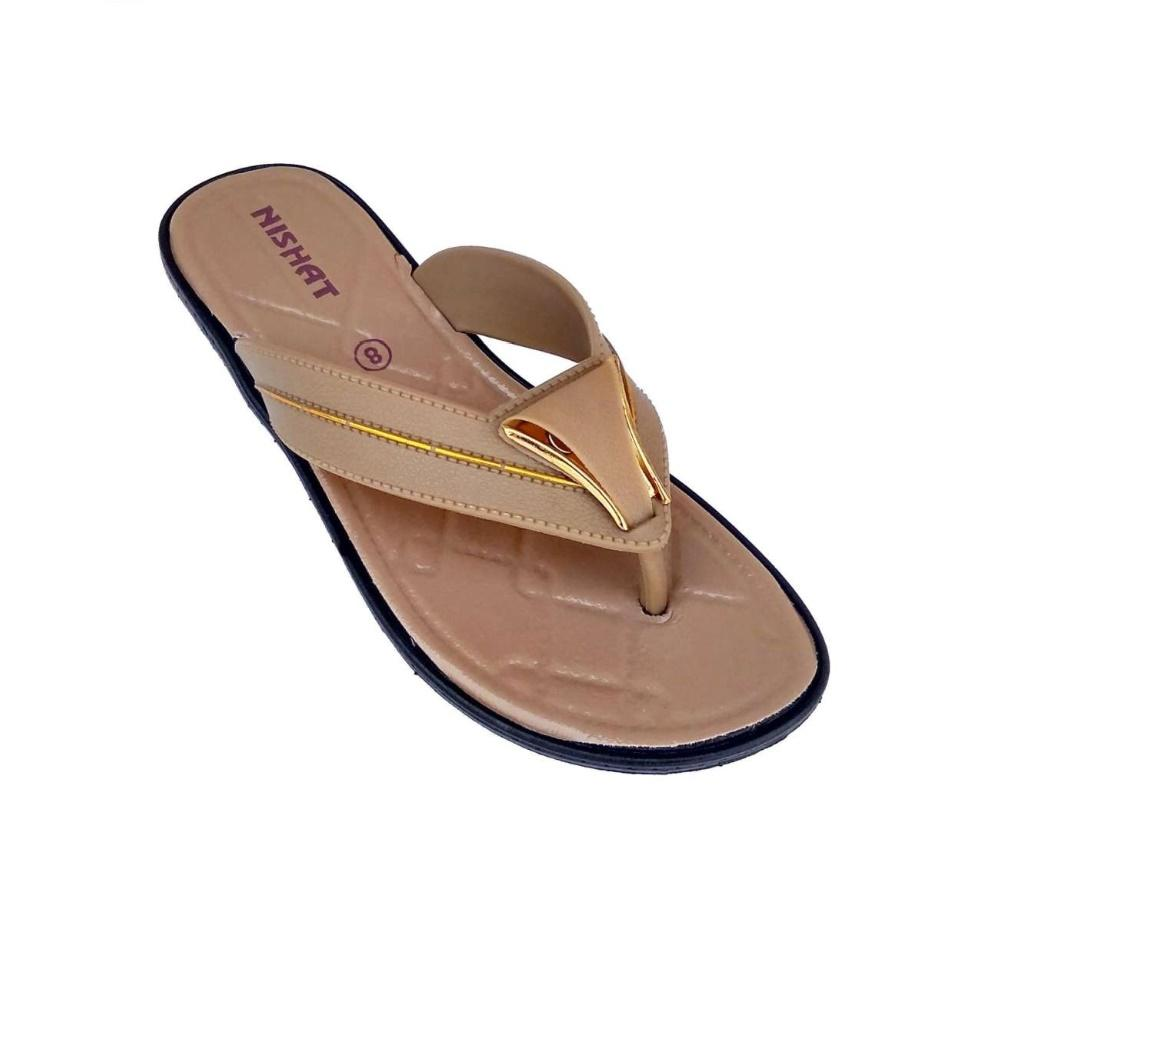 b27c55ea1 Women's Shoes - Buy Ladies Footwear Online - Daraz Pakistan